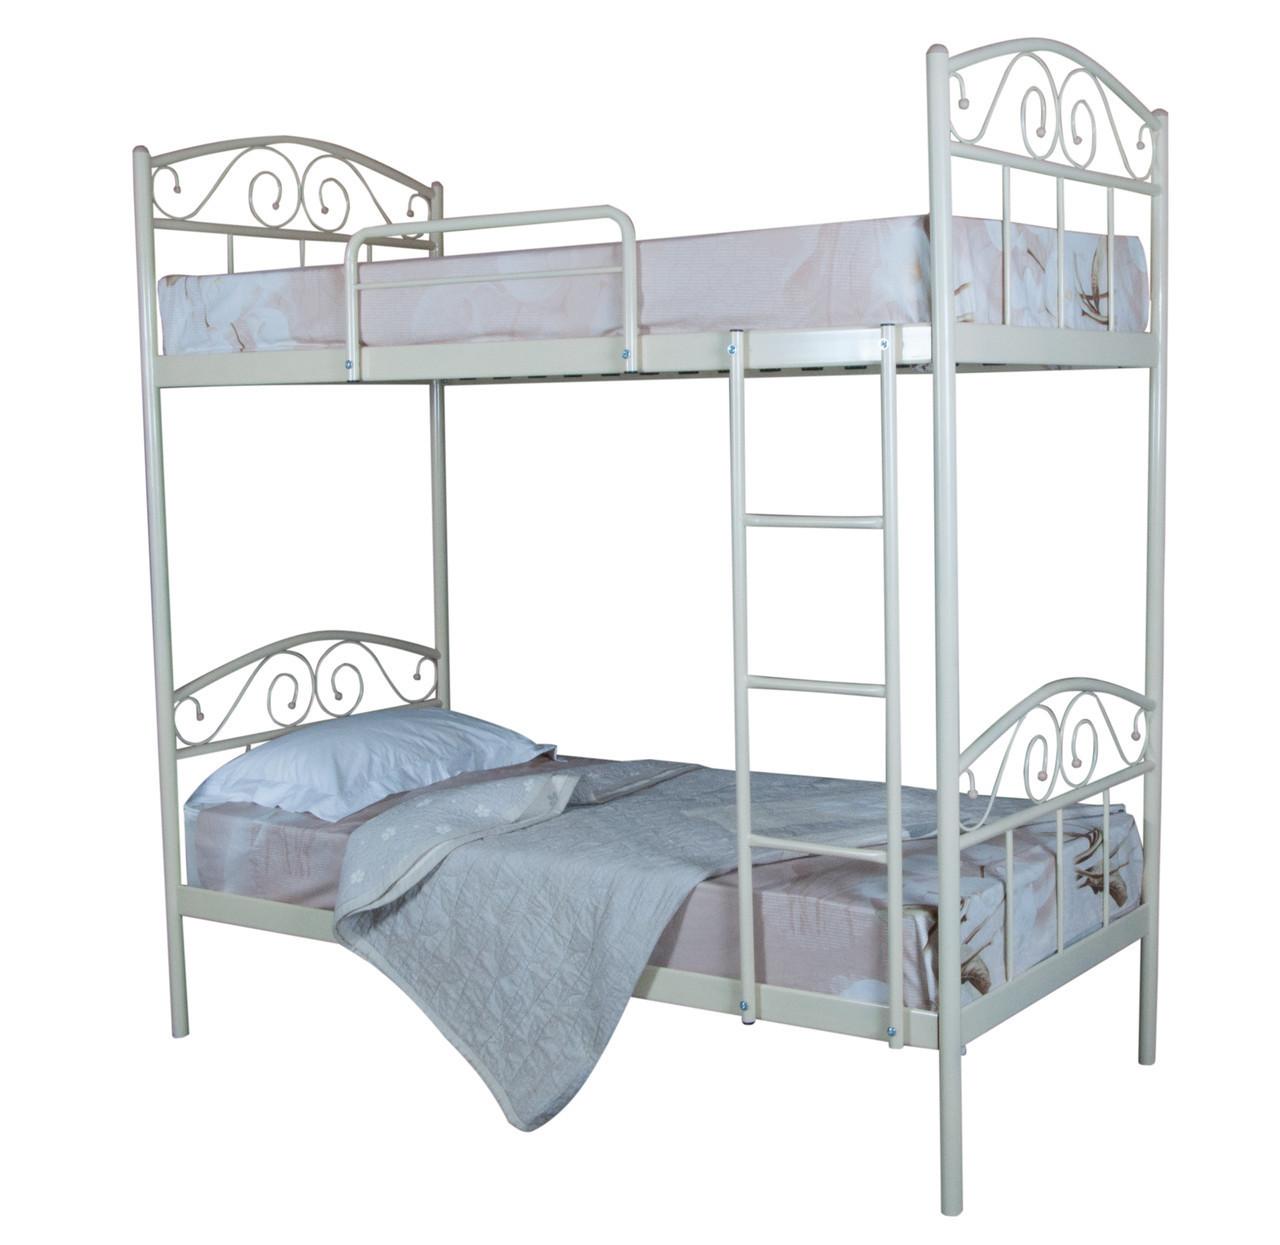 Кровать Элис Люкс двухъярусная 200х90, белая